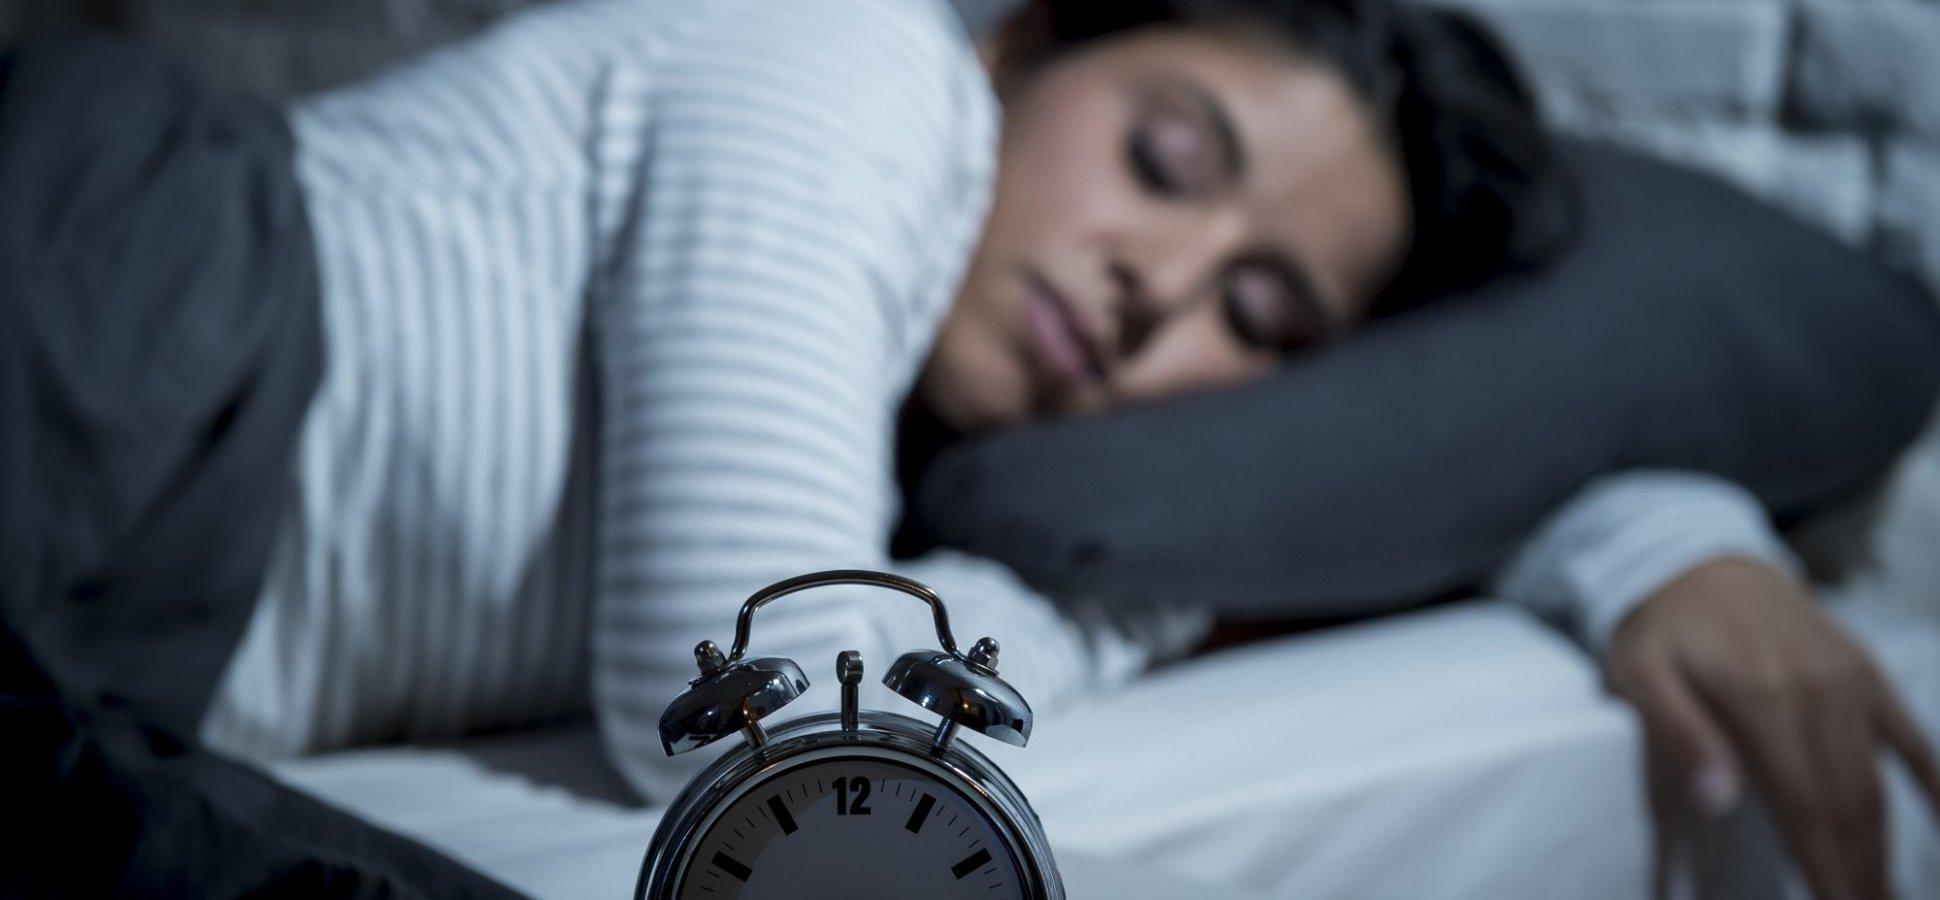 5 Surprisingly Easy Ways to Get Better Sleep